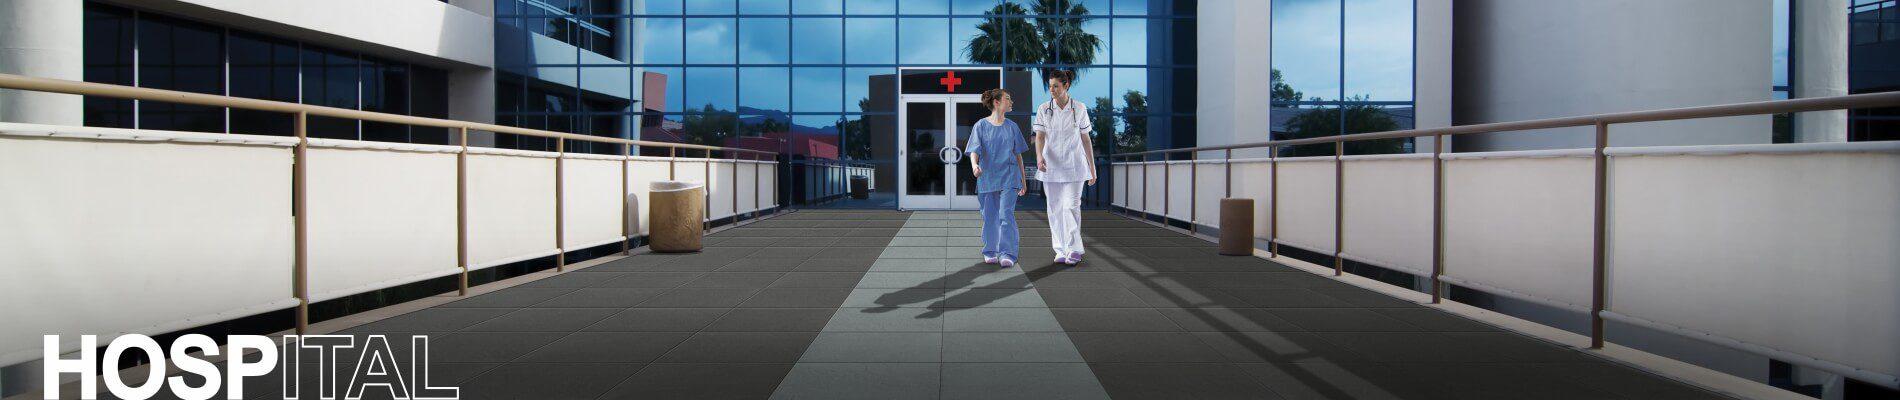 17_hospital